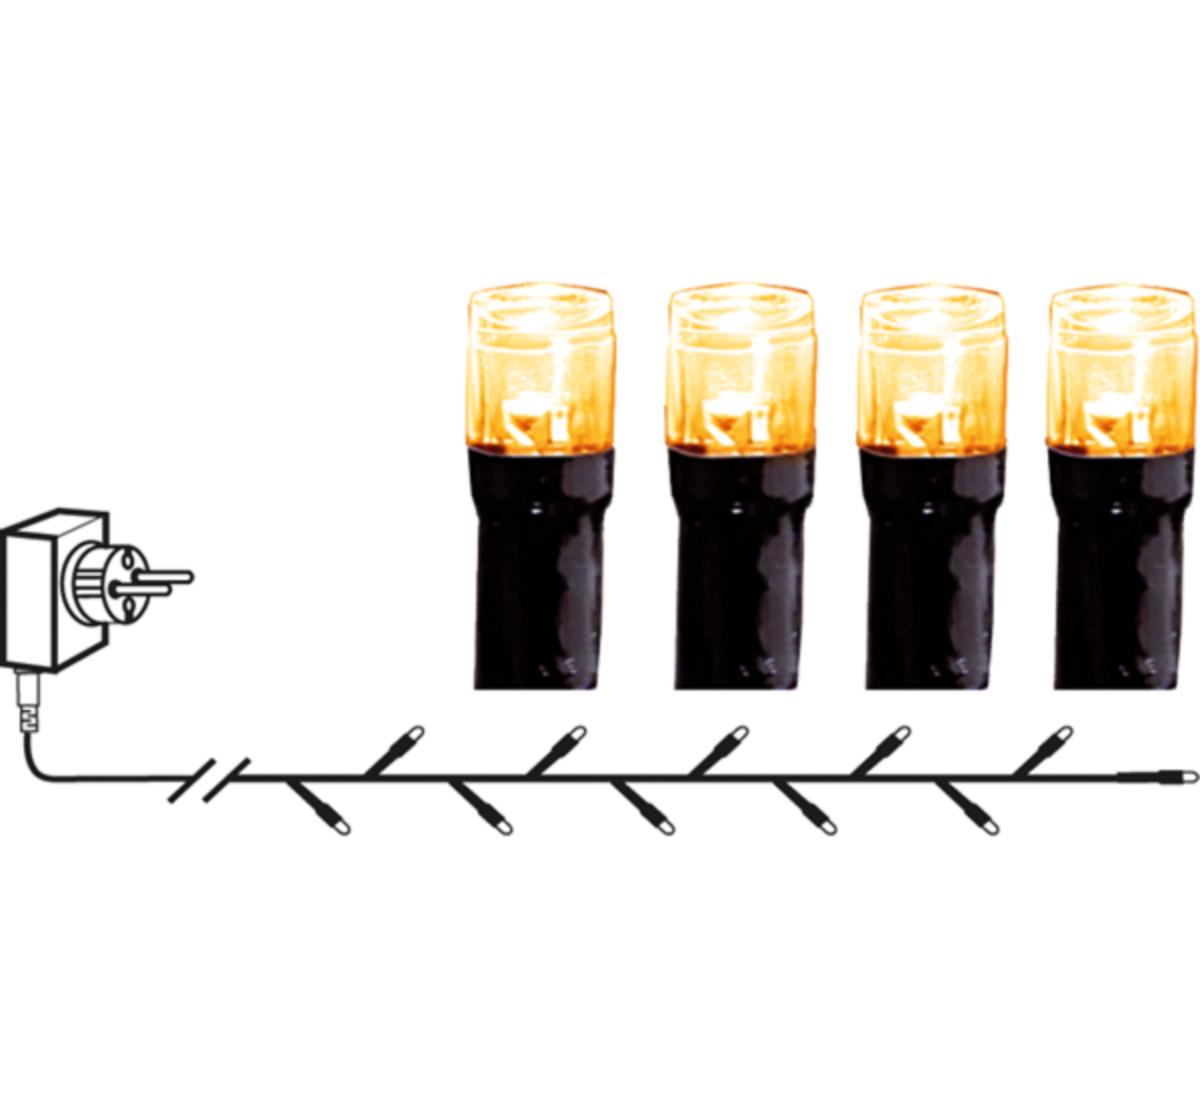 Гирлянда уличная LED STAR TRADING 594-17 - Фото №28